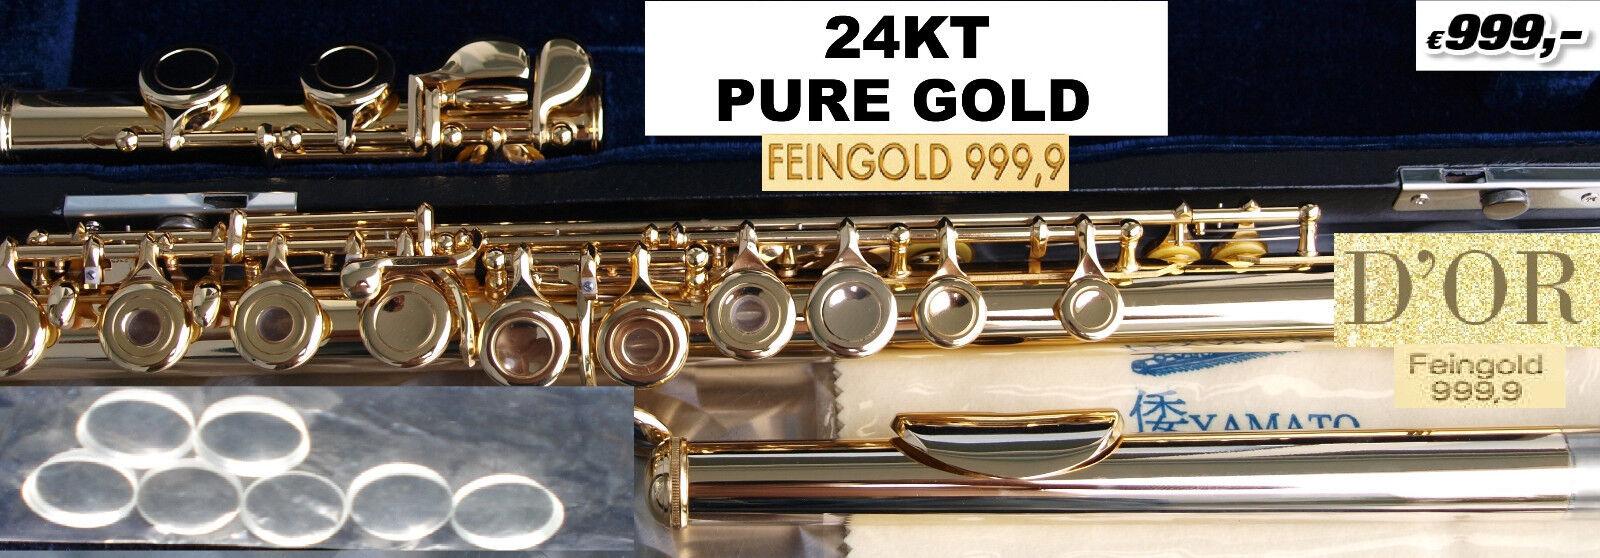 Querflöte GelbGold 999, Transverse Flute 24K Flûte Traversière OR flauta